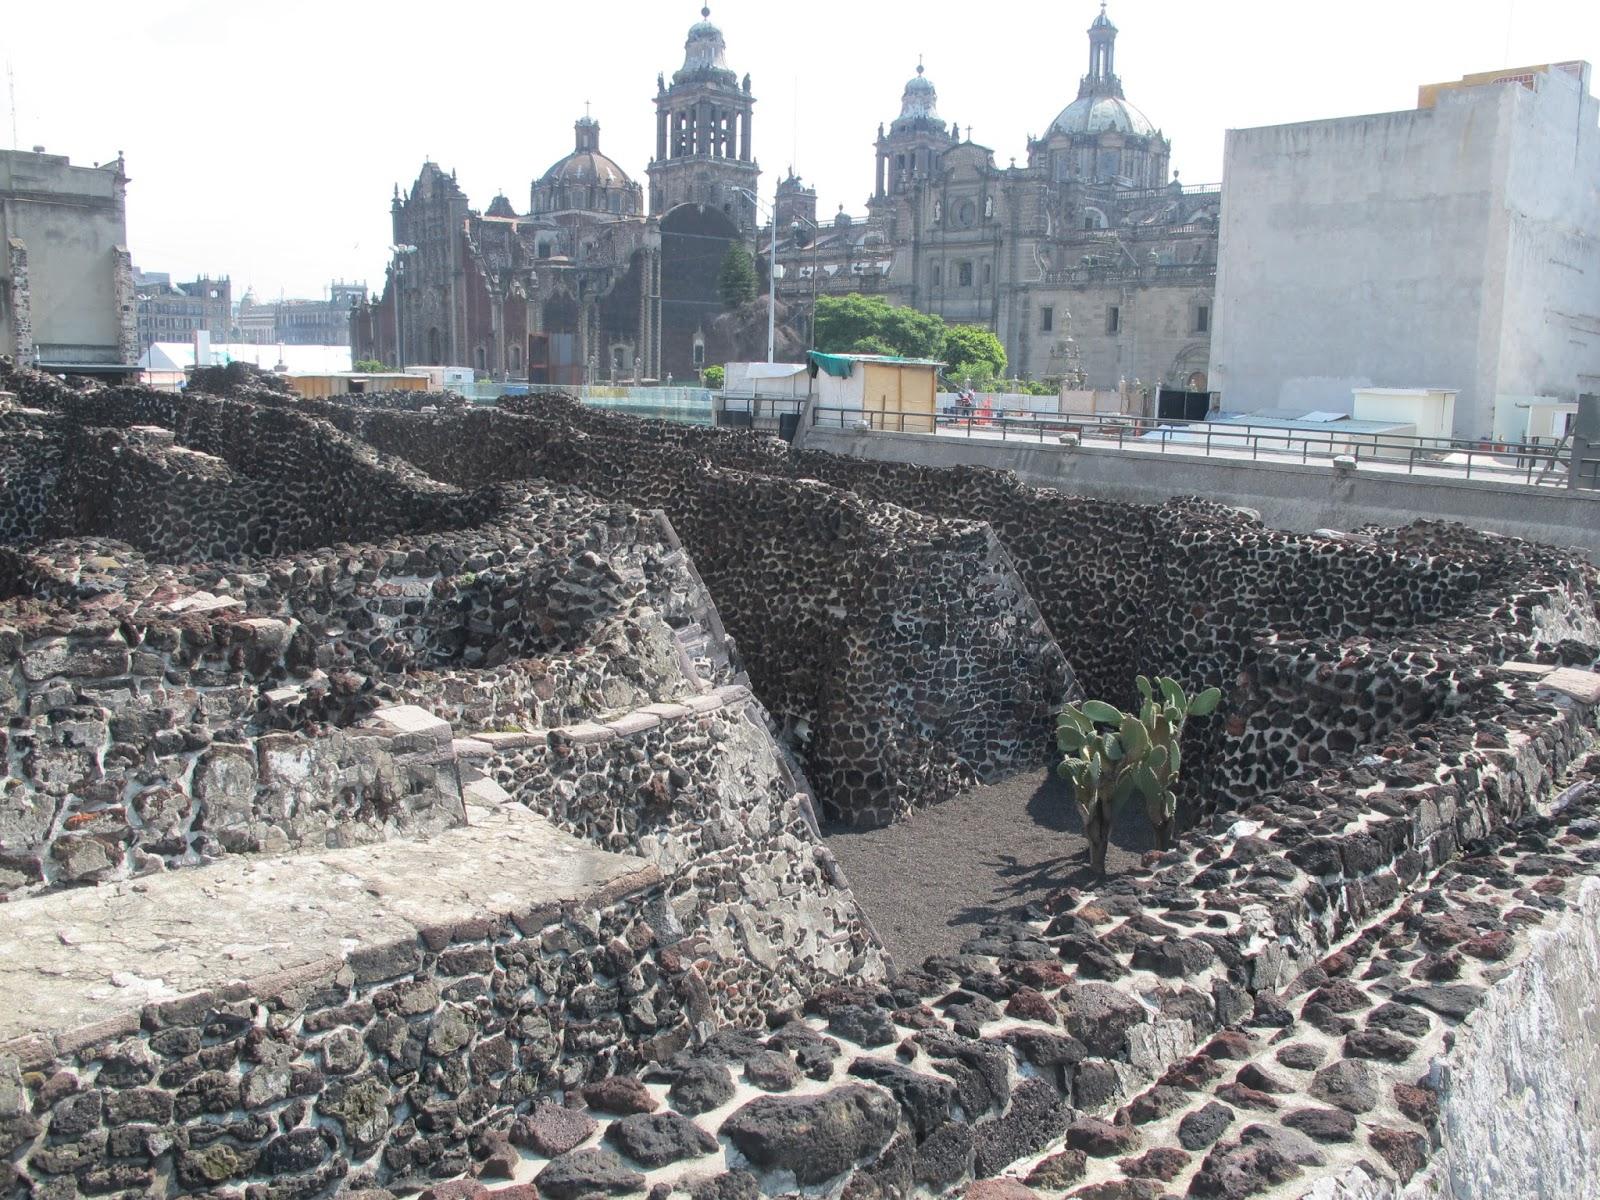 IMG_1396_Templo_Mayor mexico city.jpg